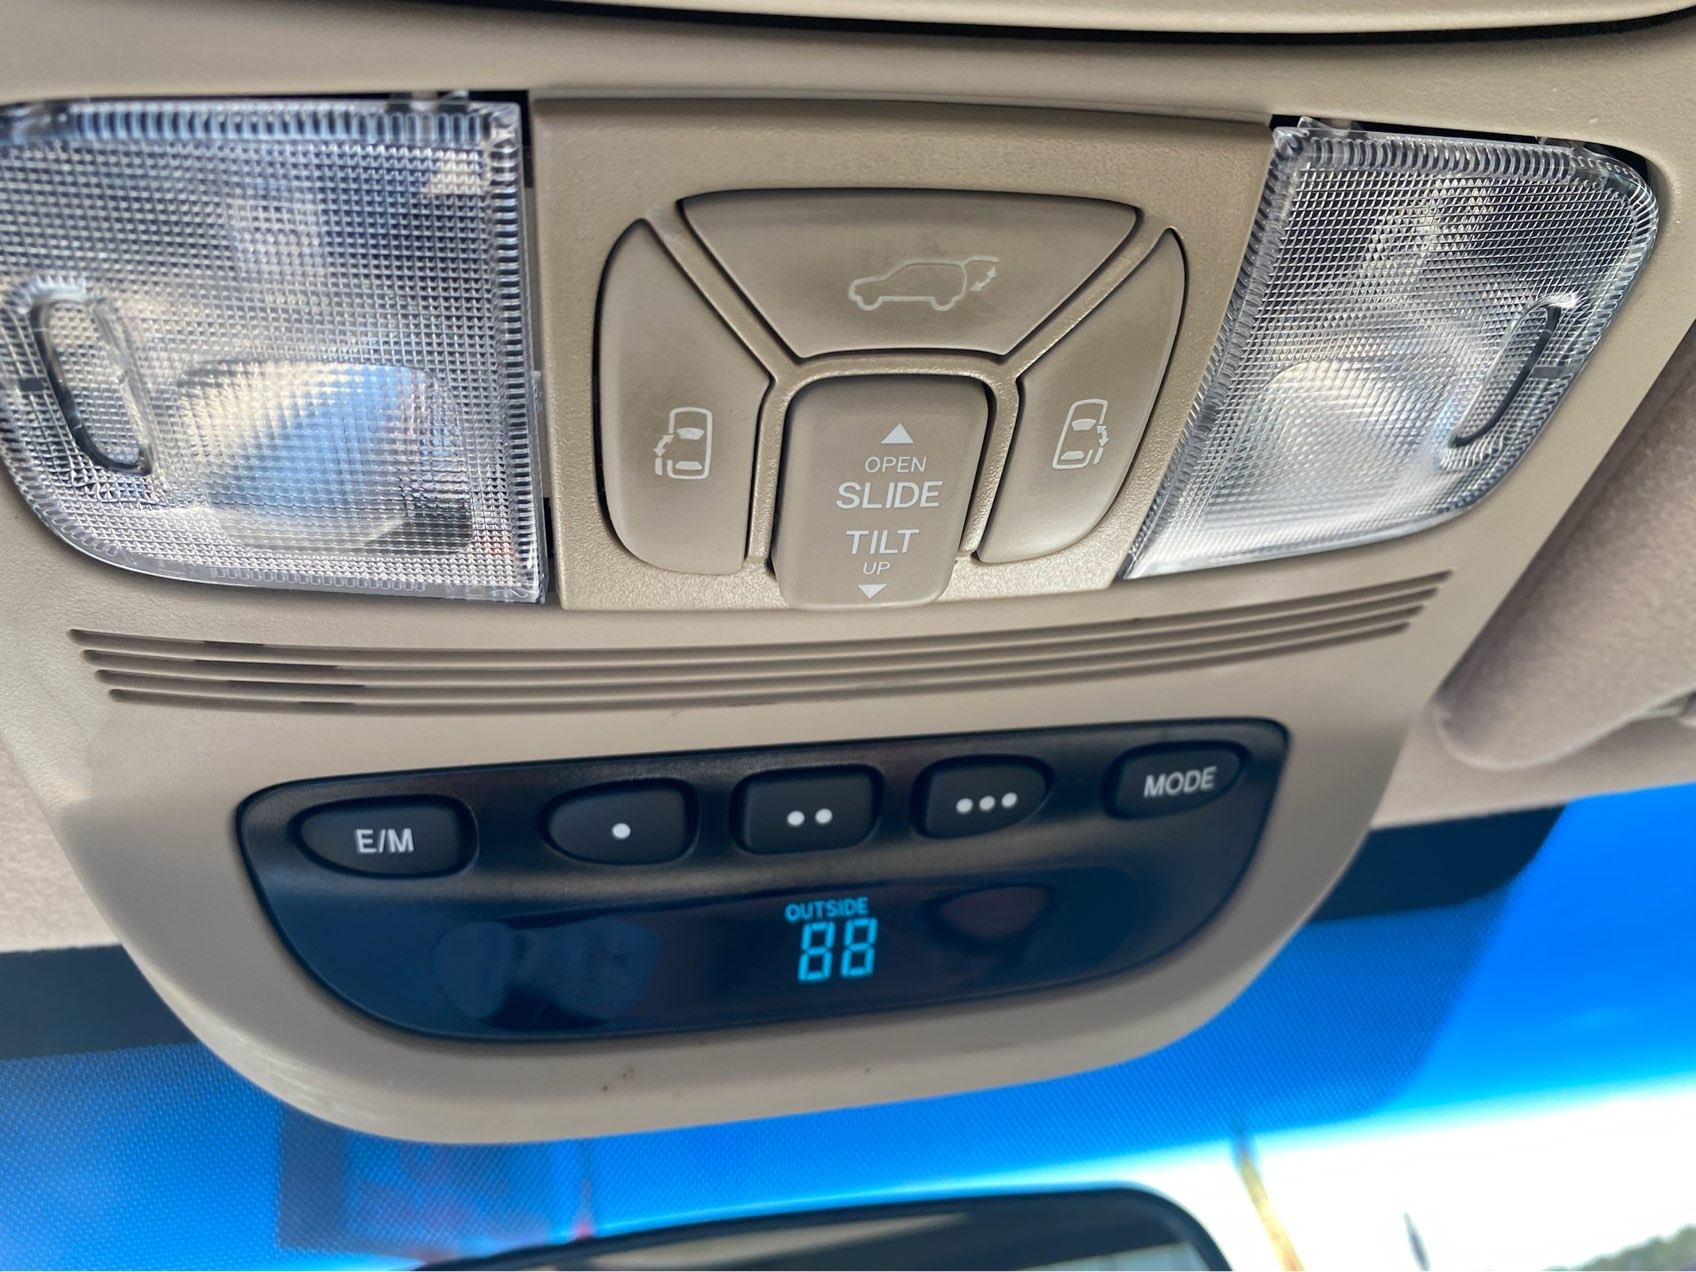 used vehicle - Passenger Van TOYOTA SIENNA 2007